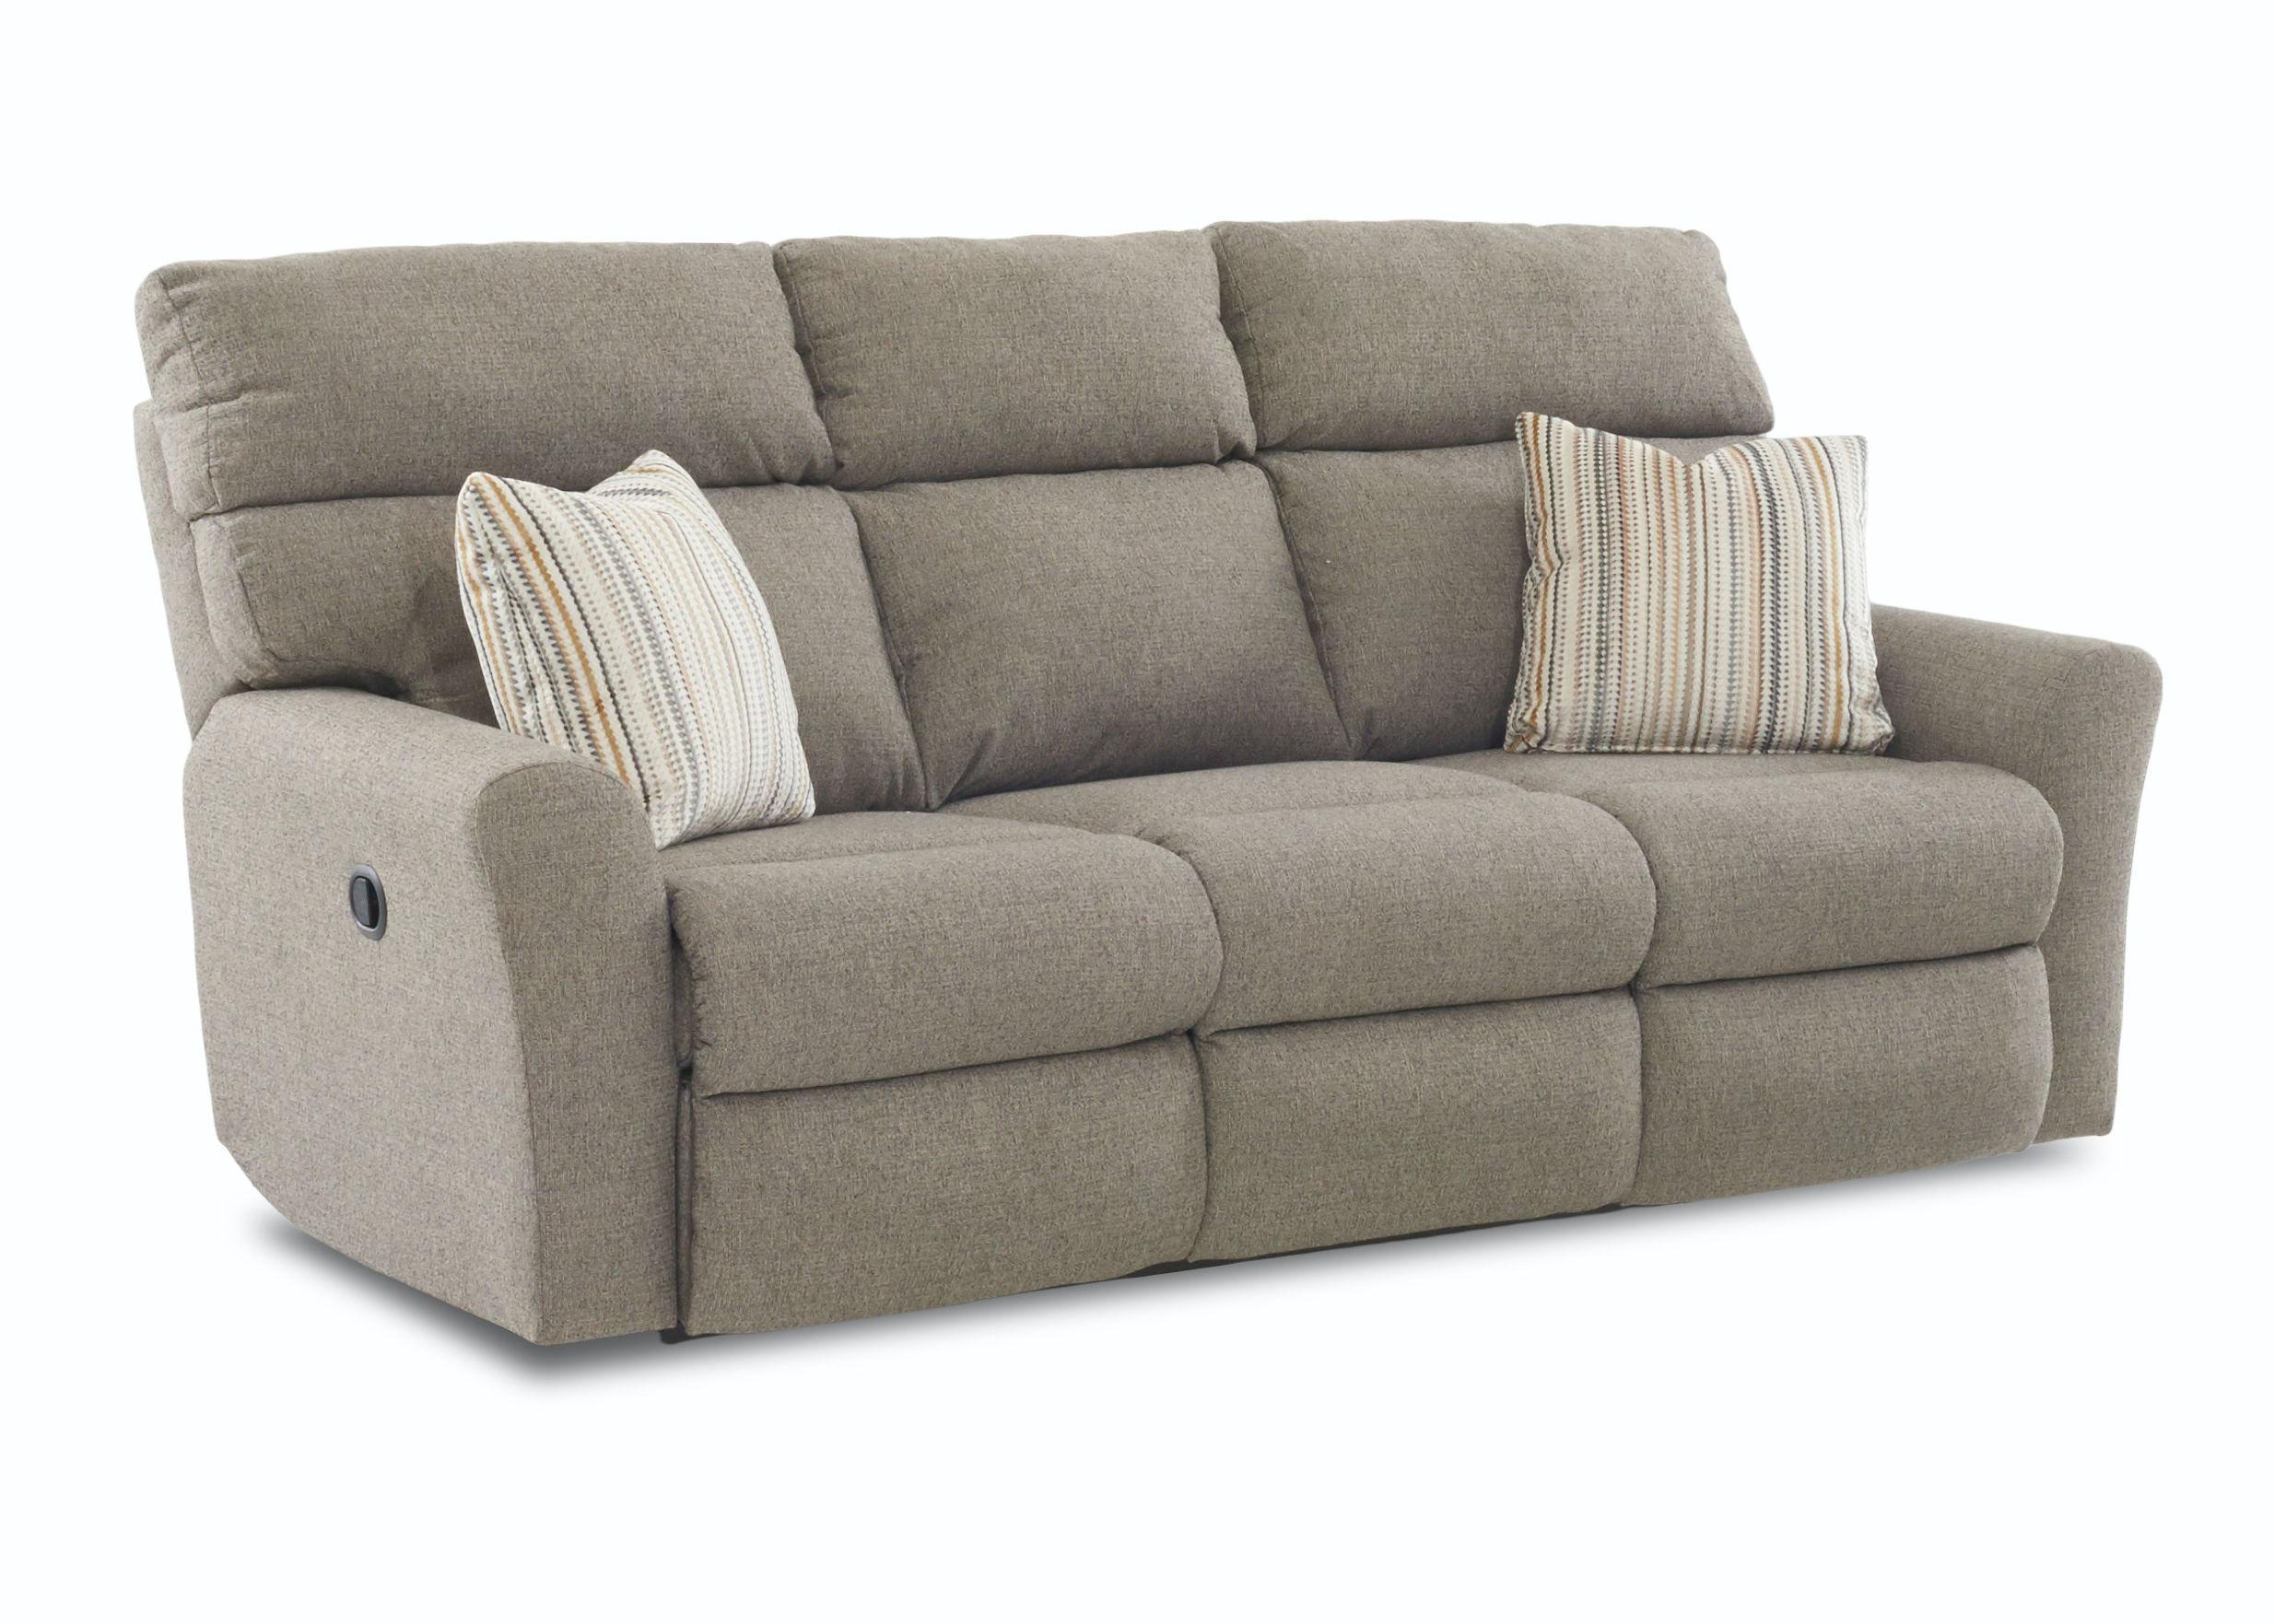 weie sofa best excellent graue wand weie couch eigentum. Black Bedroom Furniture Sets. Home Design Ideas